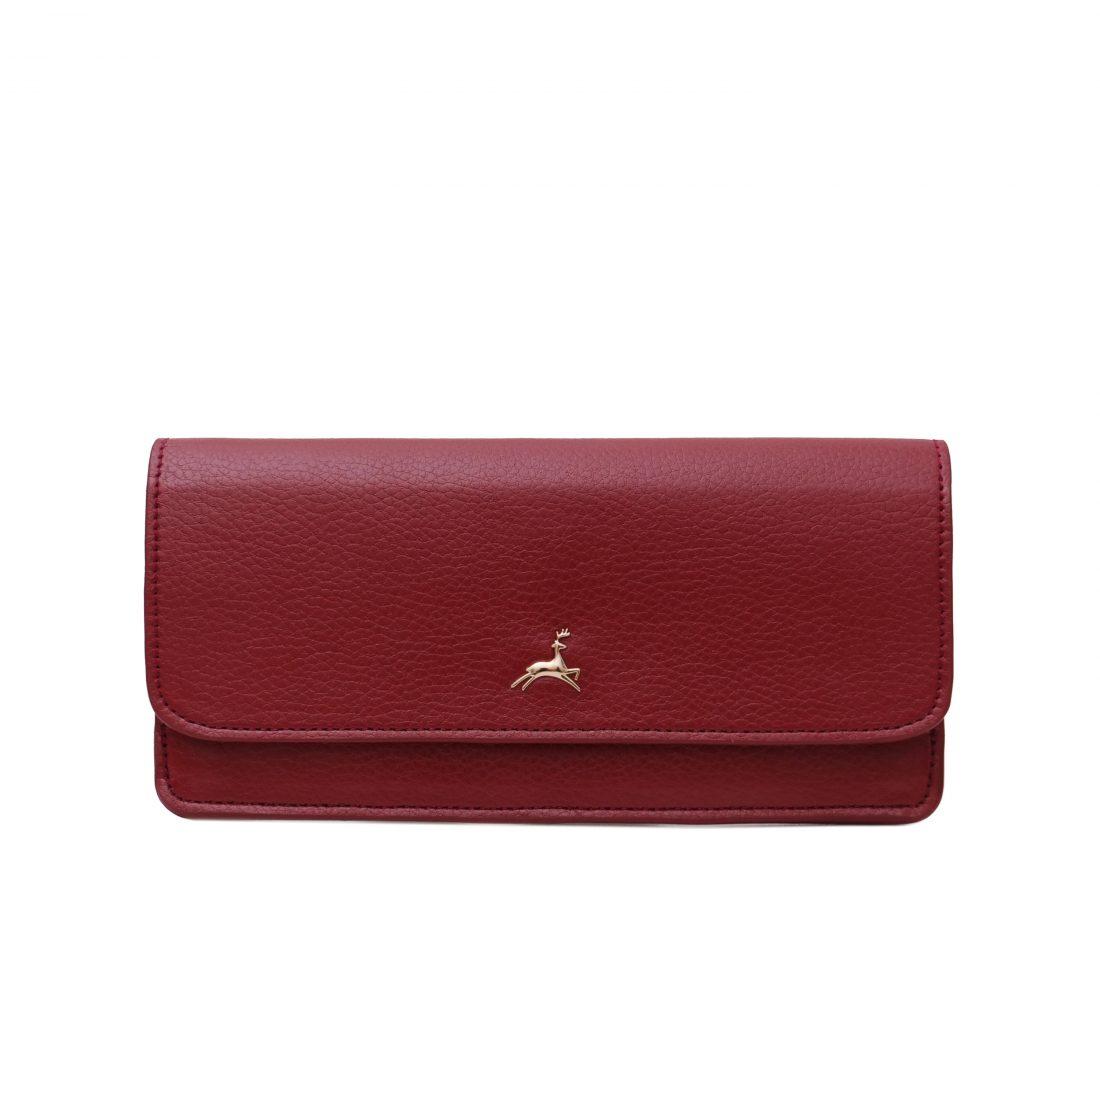 Tedu-Wallet-red-1